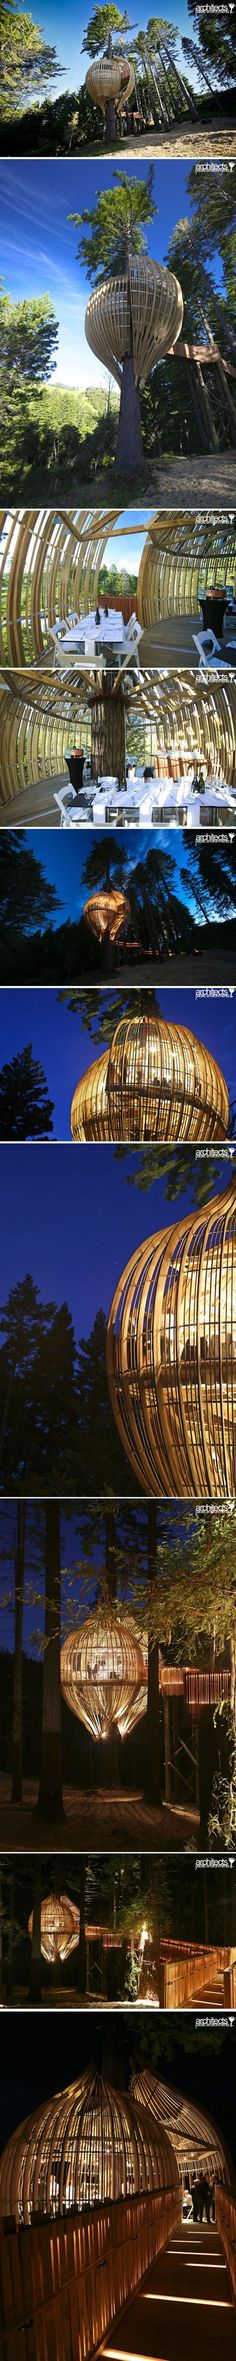 The Yellow Treehouse Restaurant near Auckland, New Zealand